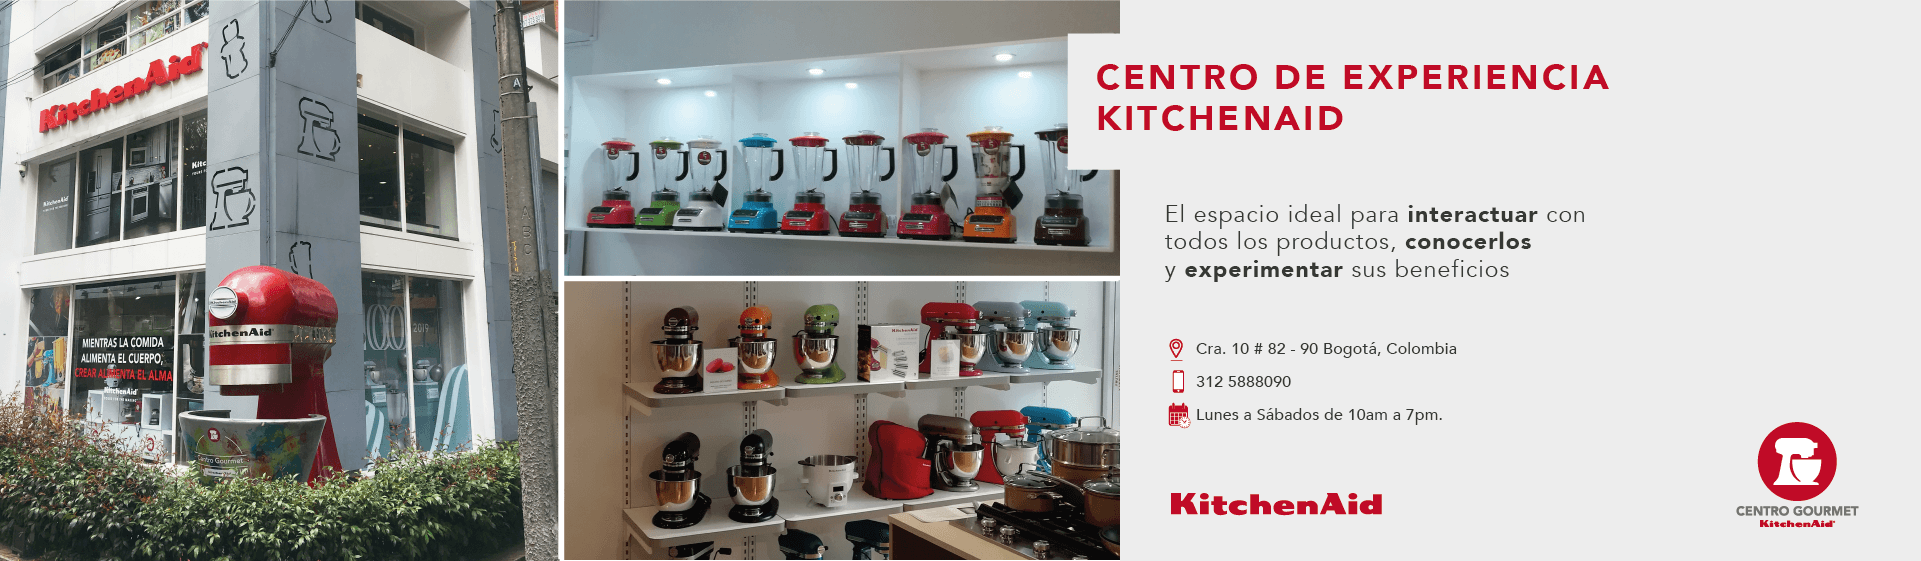 Centro de experencia KitchenAid